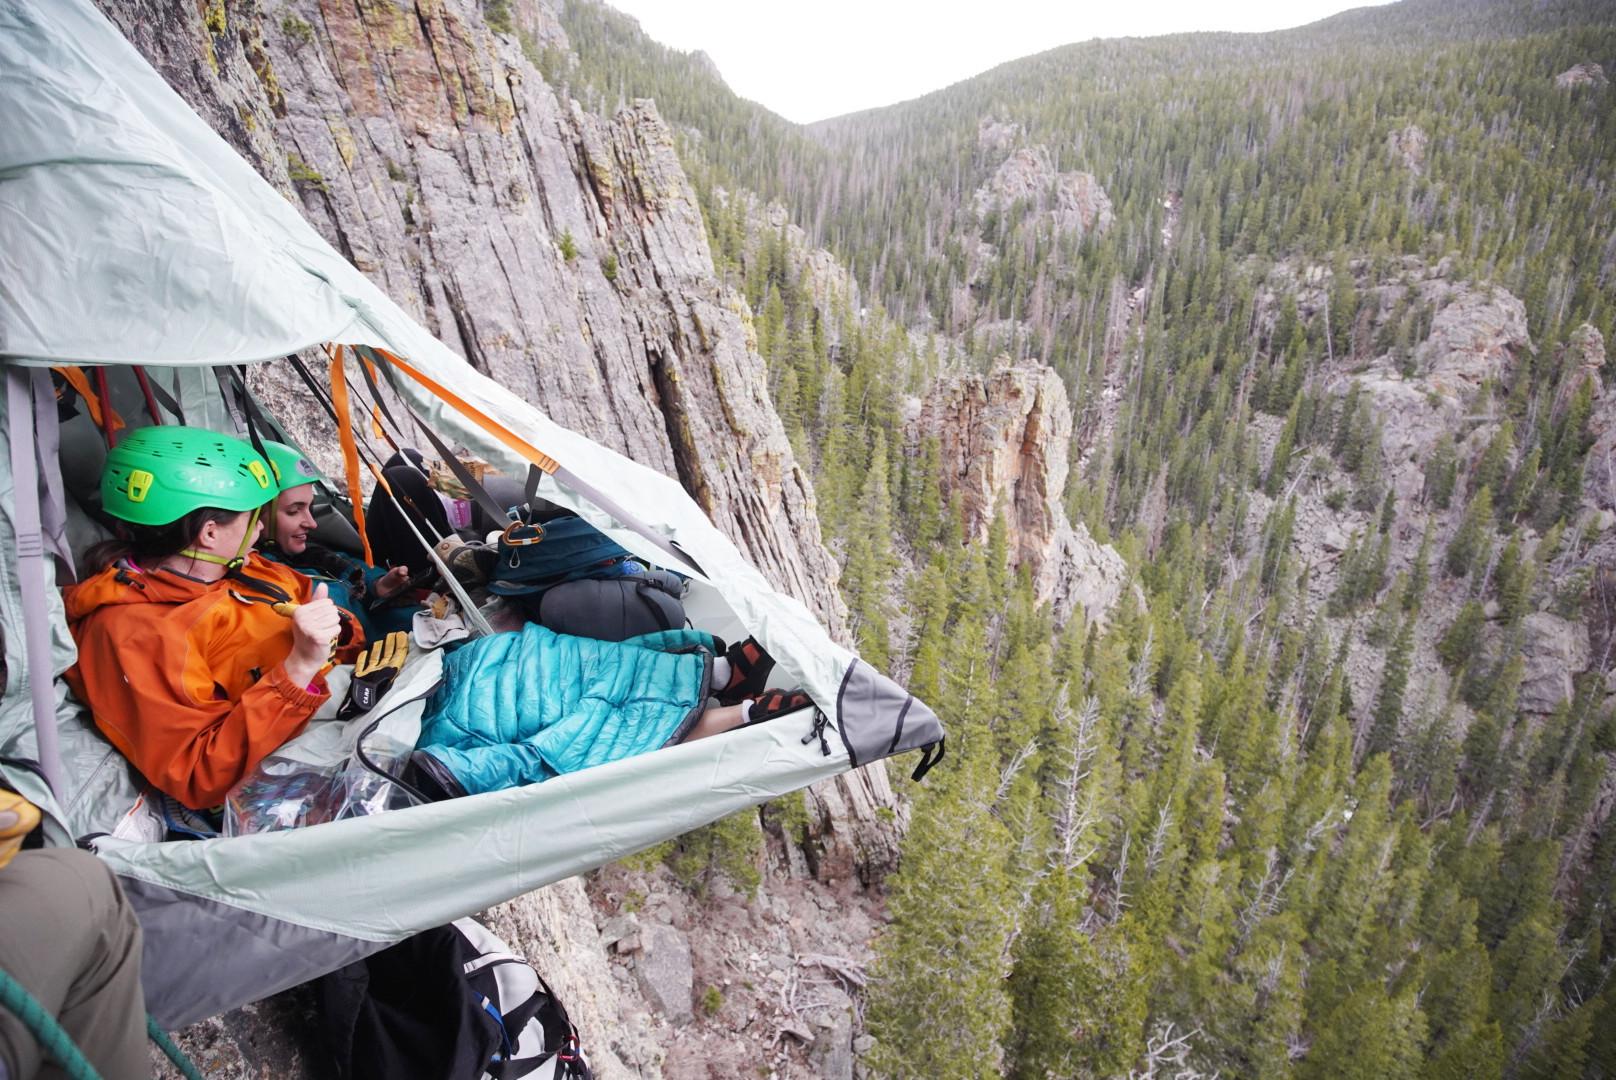 Cliff camping in Colorado Airbnb Adventures